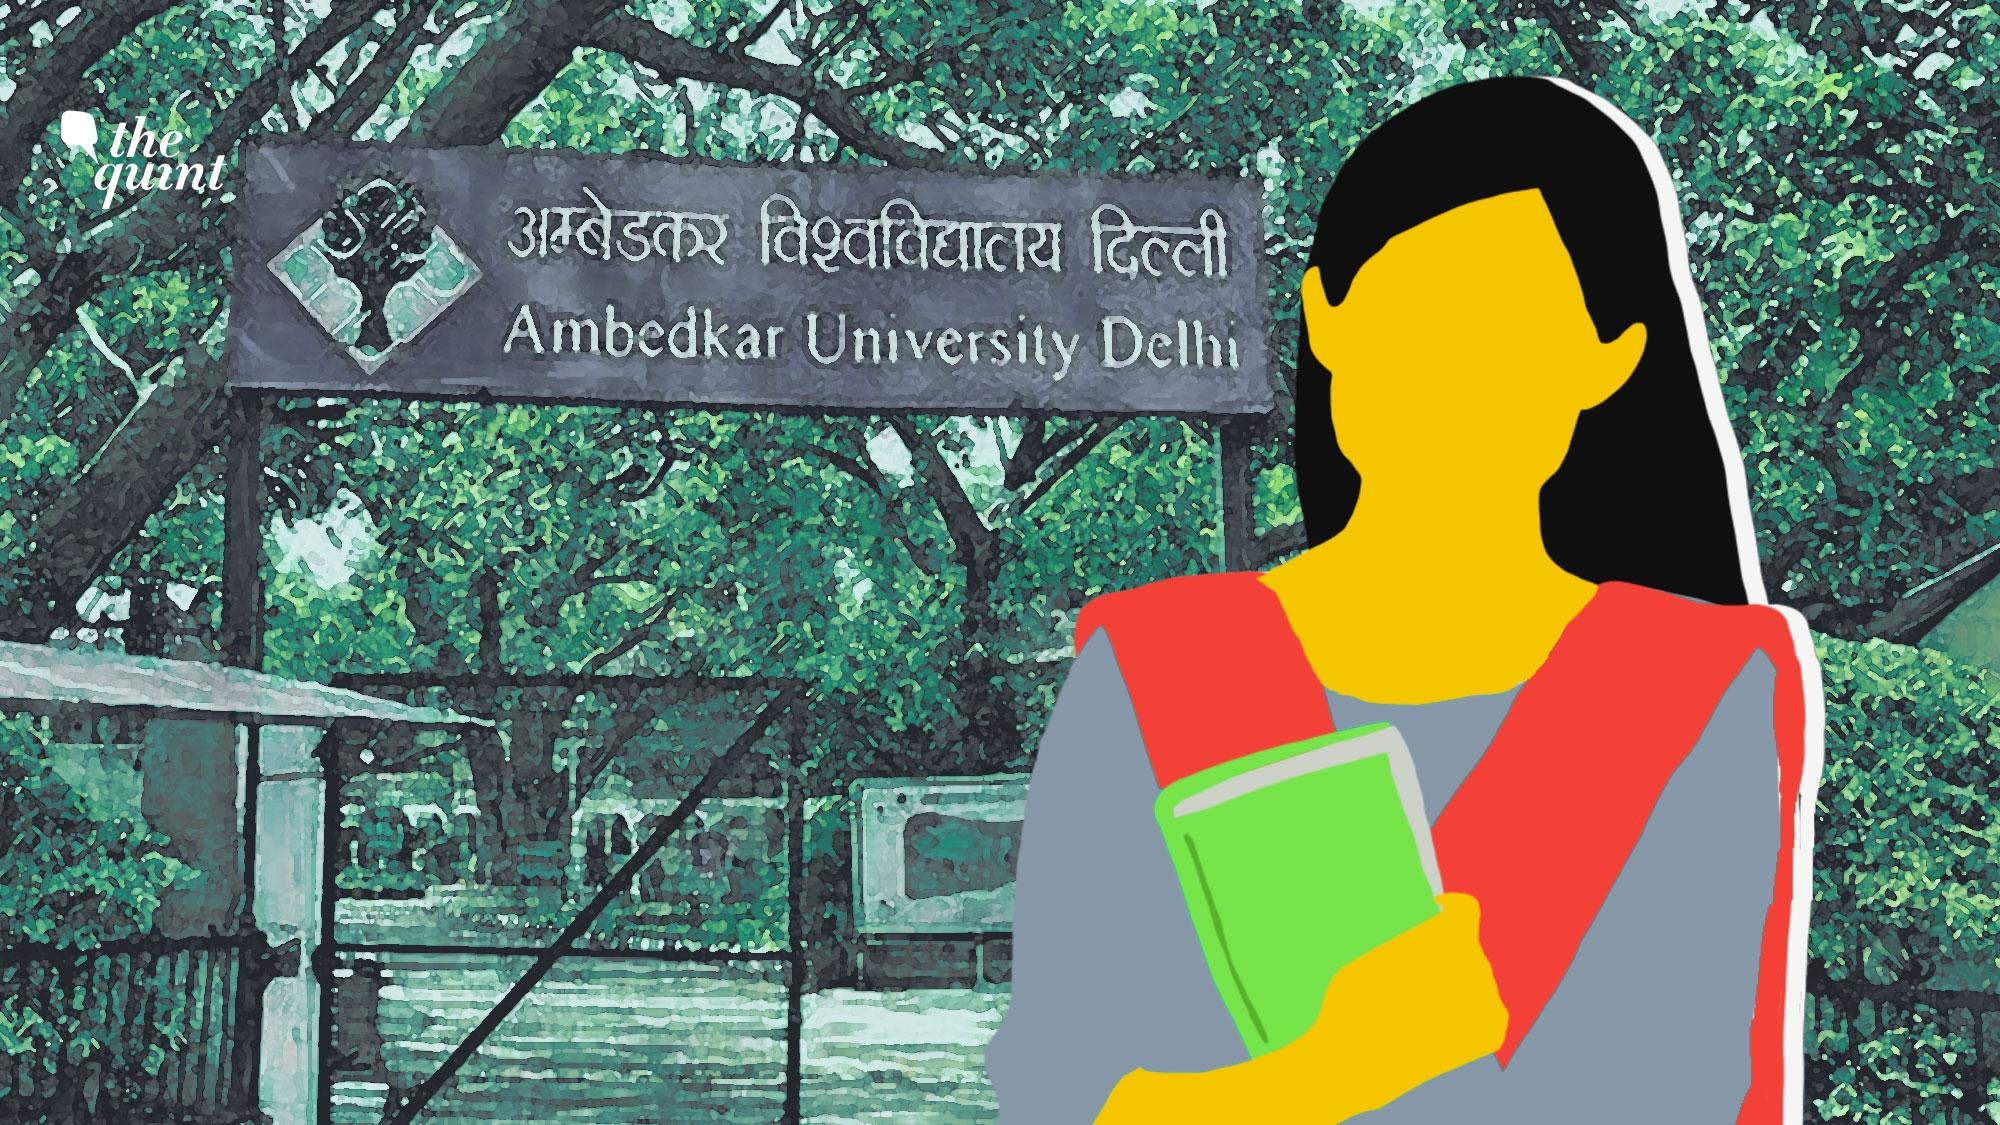 Ambedkar Univ Dalit Scholar Alleges Caste Humiliation by Batchmate